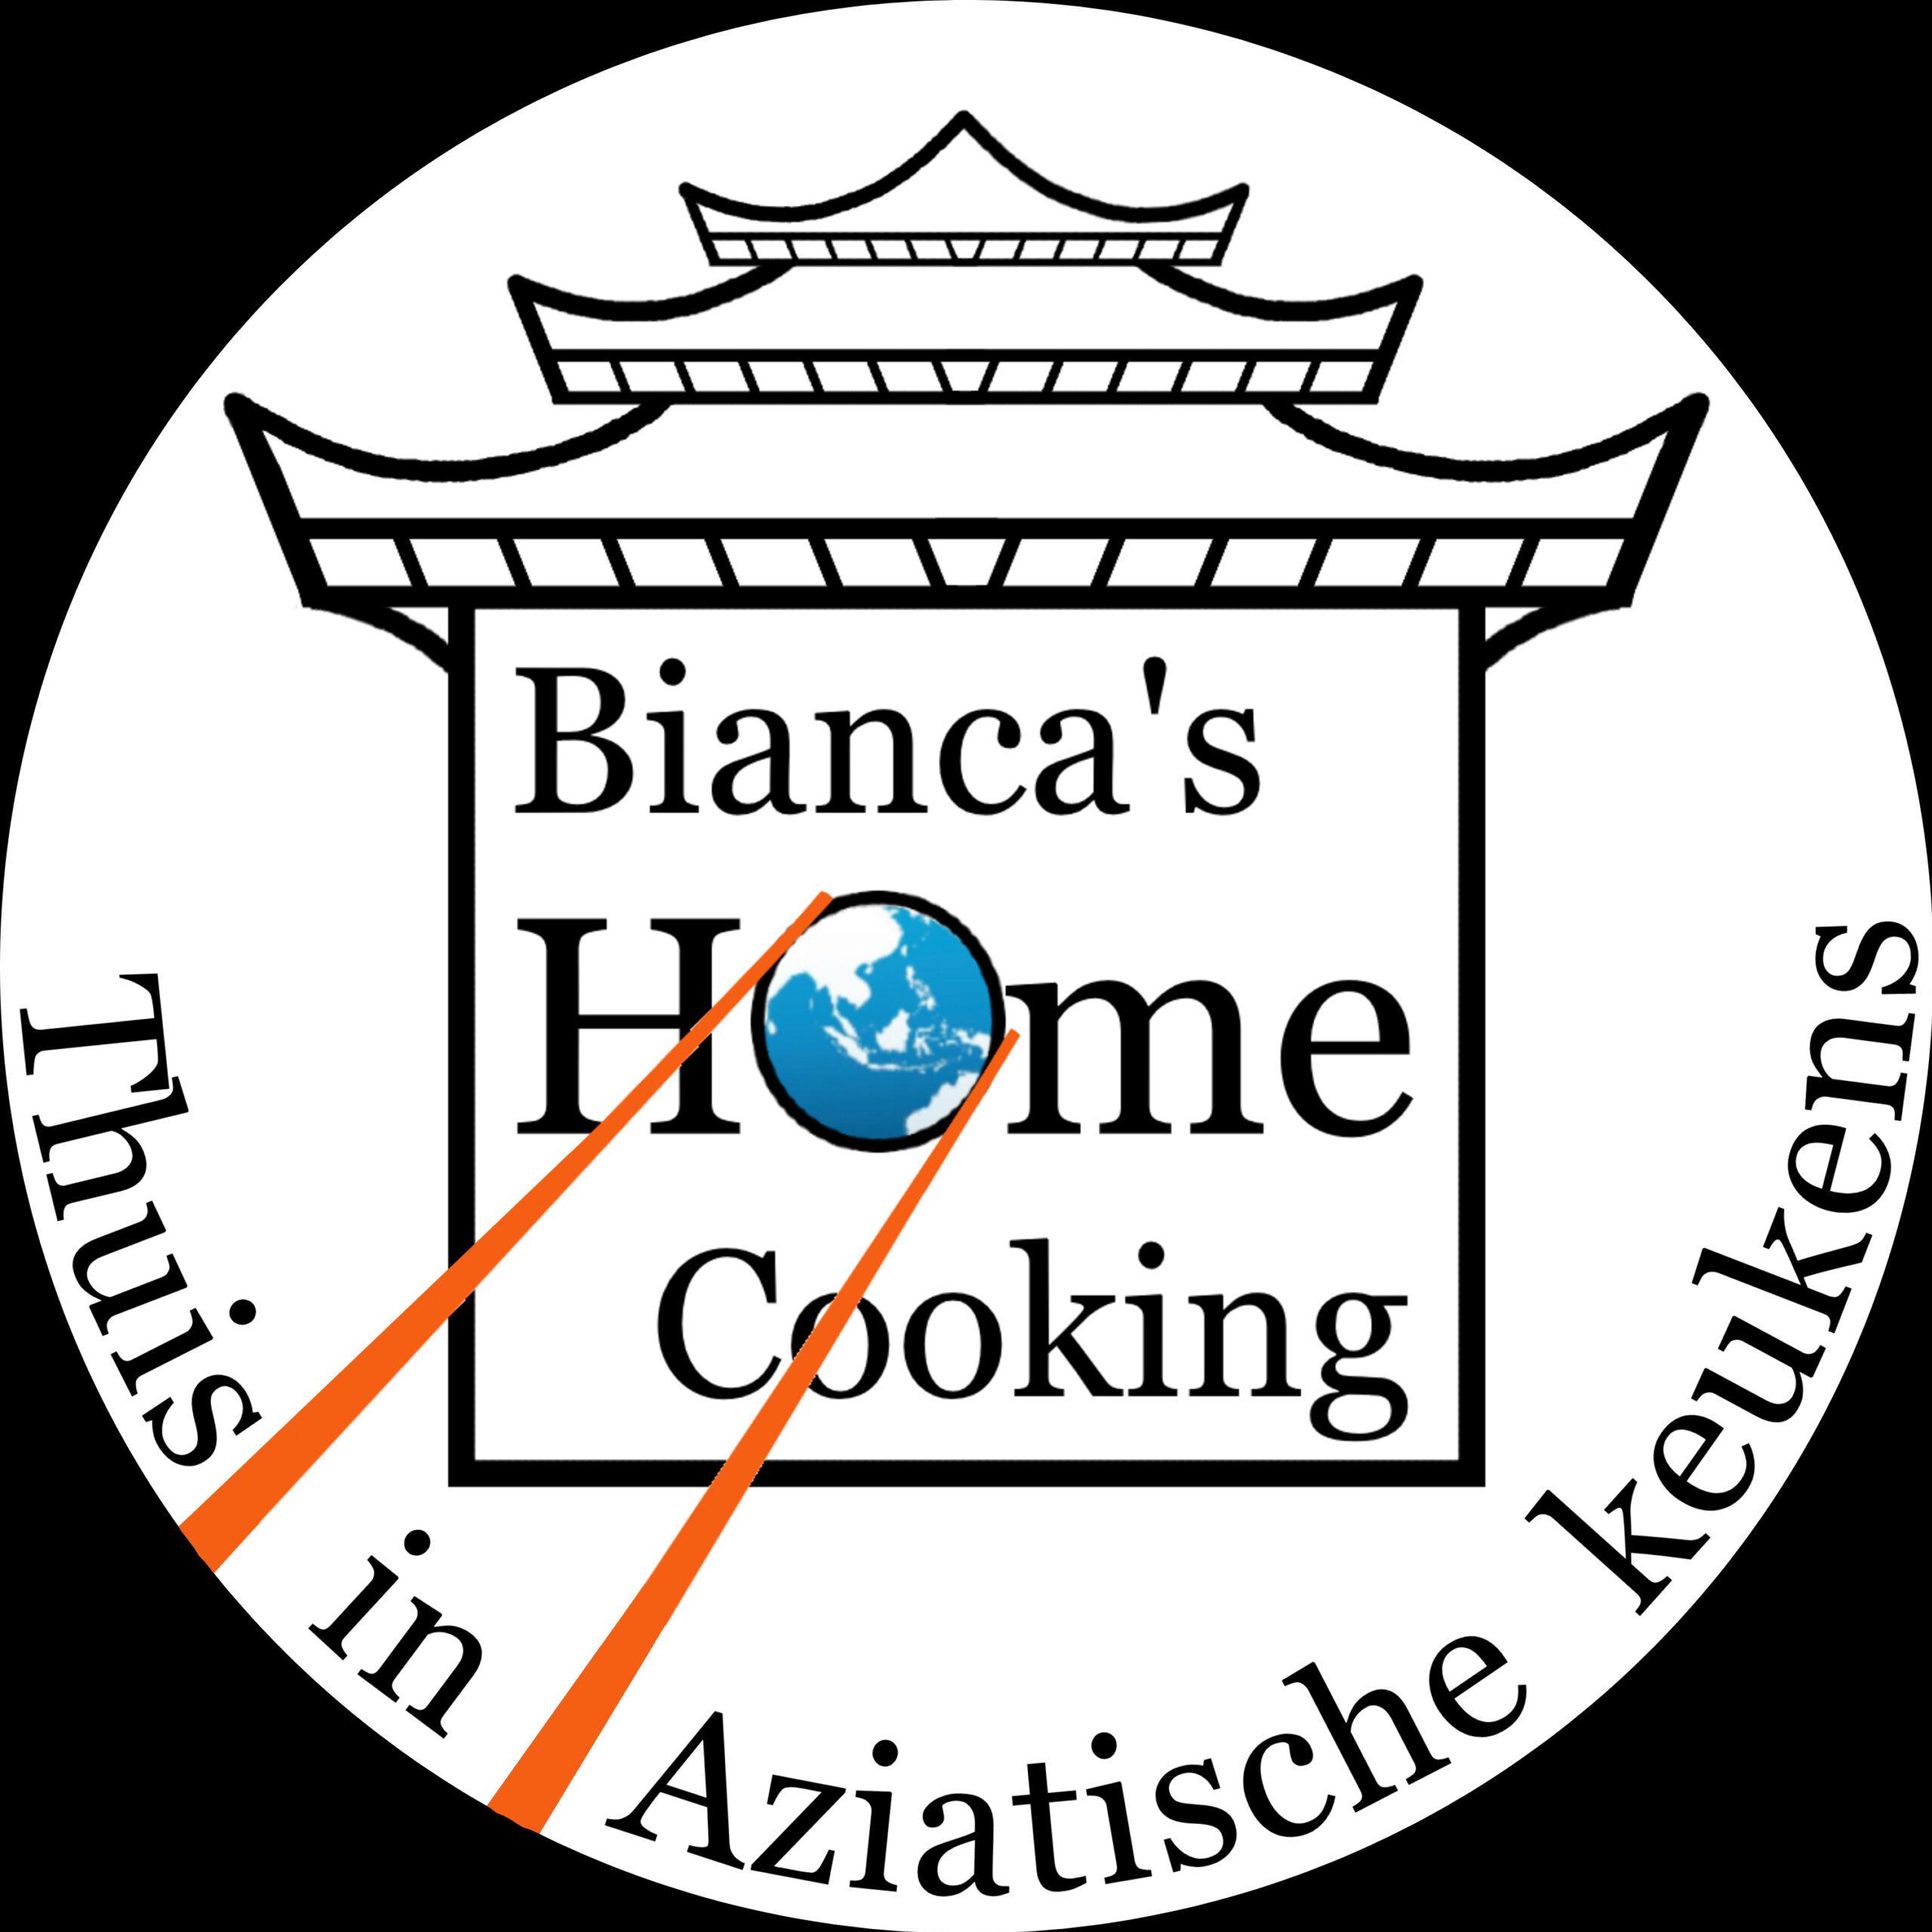 Bianca's Homecooking